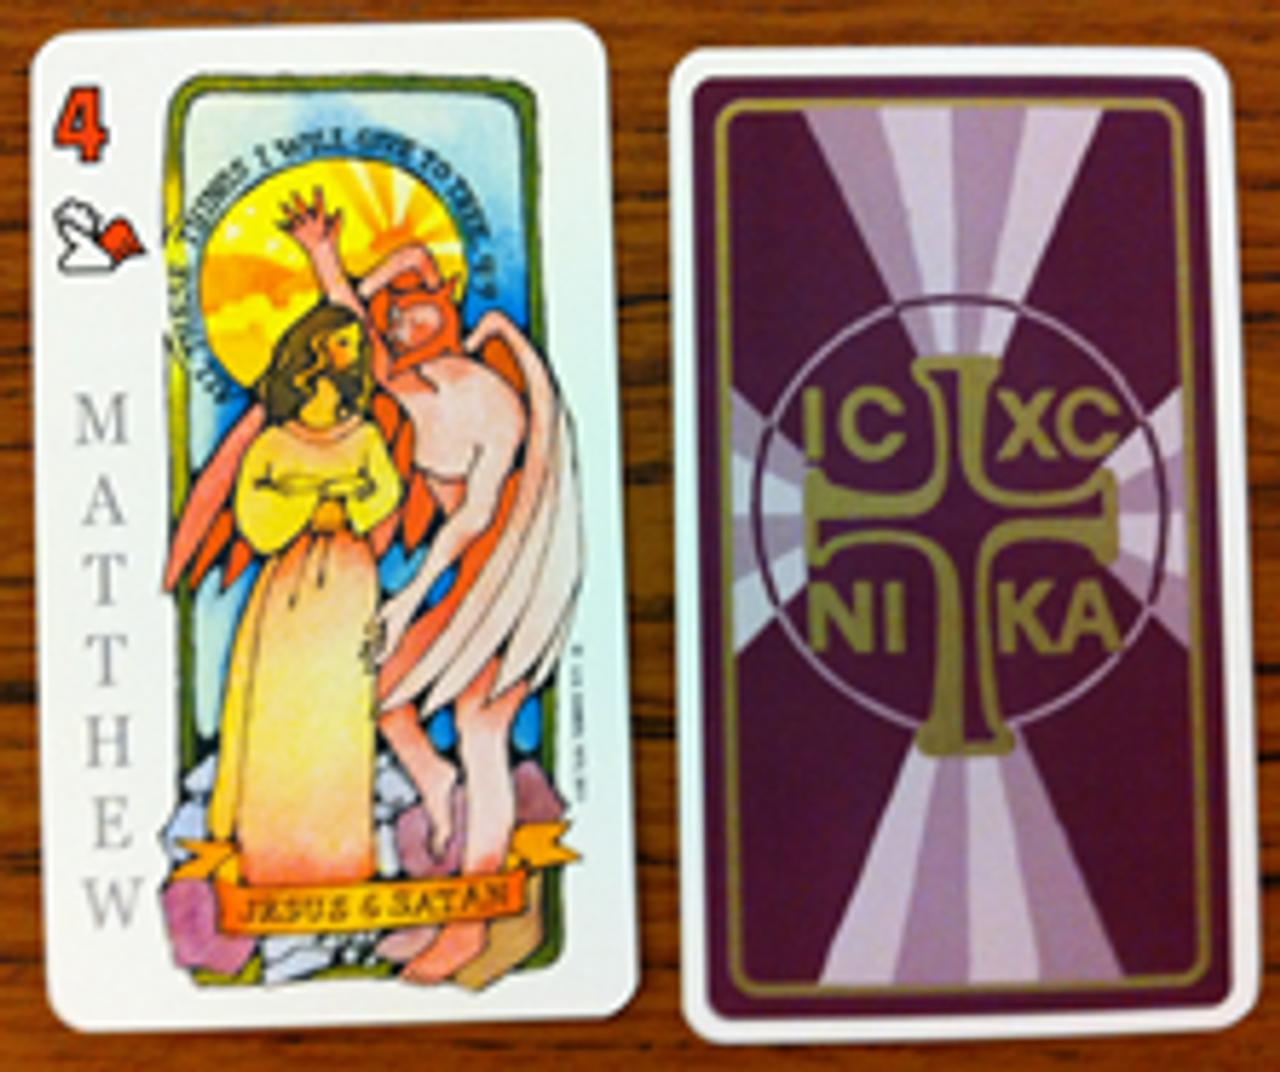 Jesus Deck - Cards that beautifully illustrate Jesus' Life - use for meditation, teaching or evangelism!